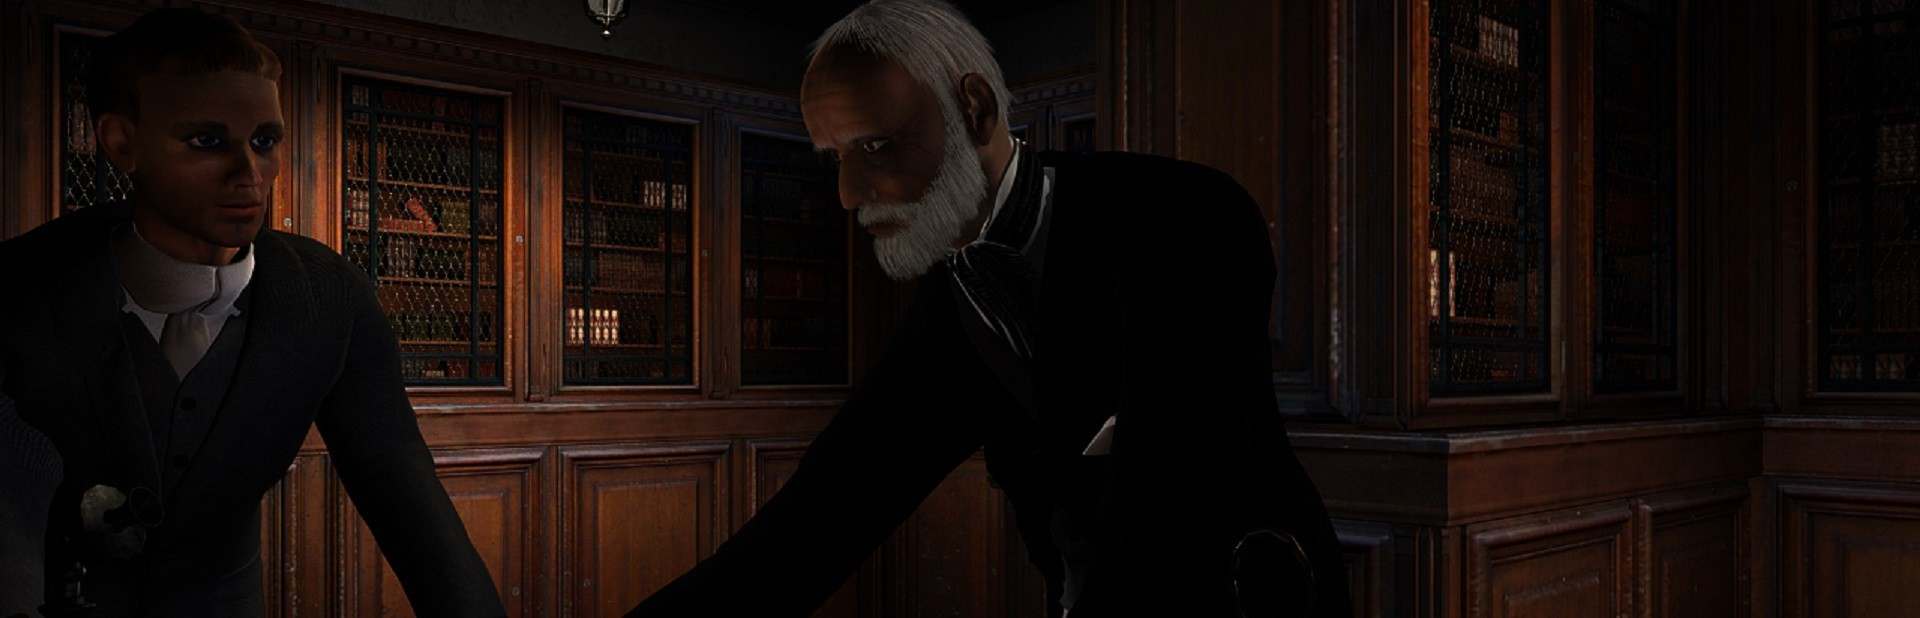 The Cameron Files: The Secret at Loch Ness screenshot